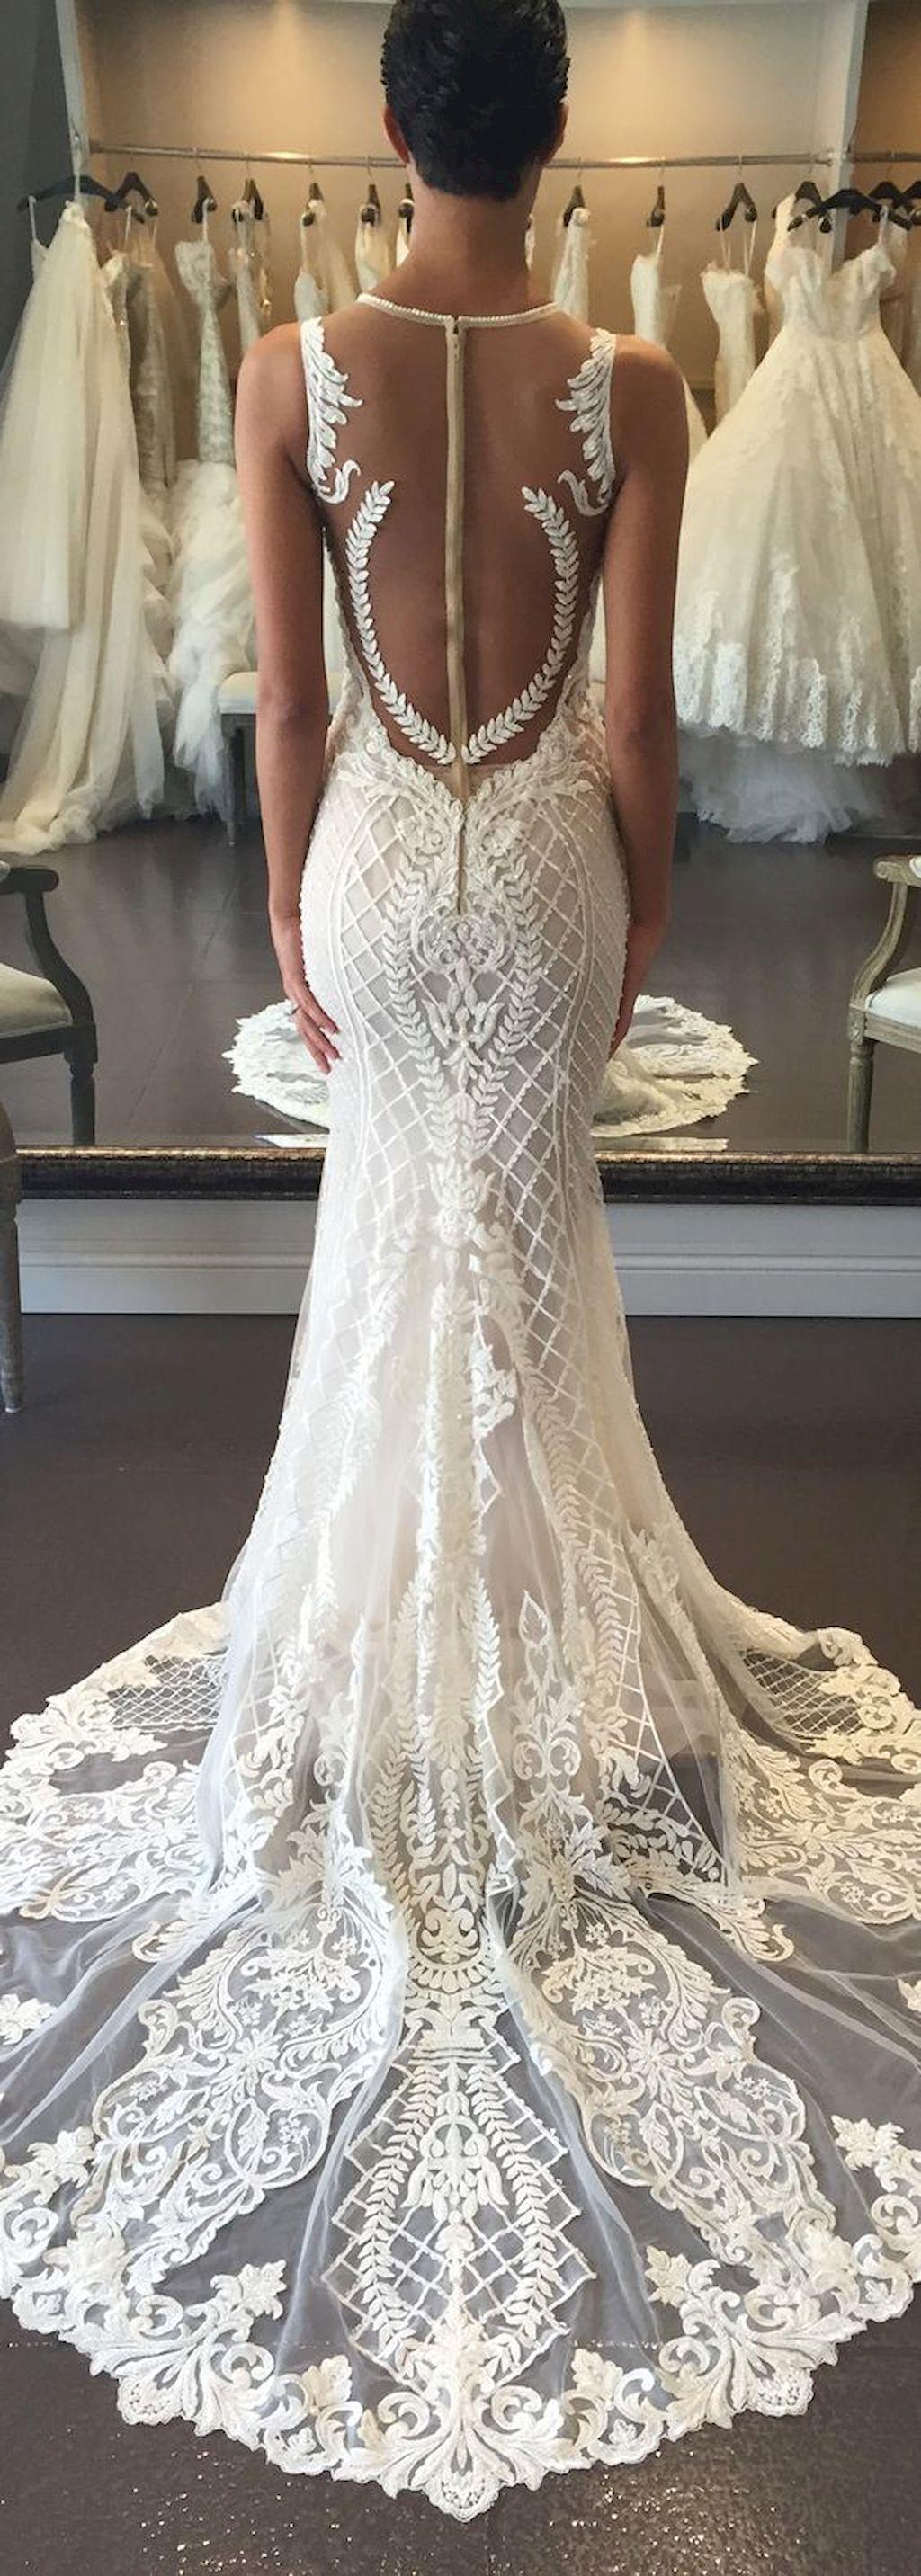 Versace wedding dress  Pin by mk on Wedding  Pinterest  Wedding dresses Wedding and Dresses